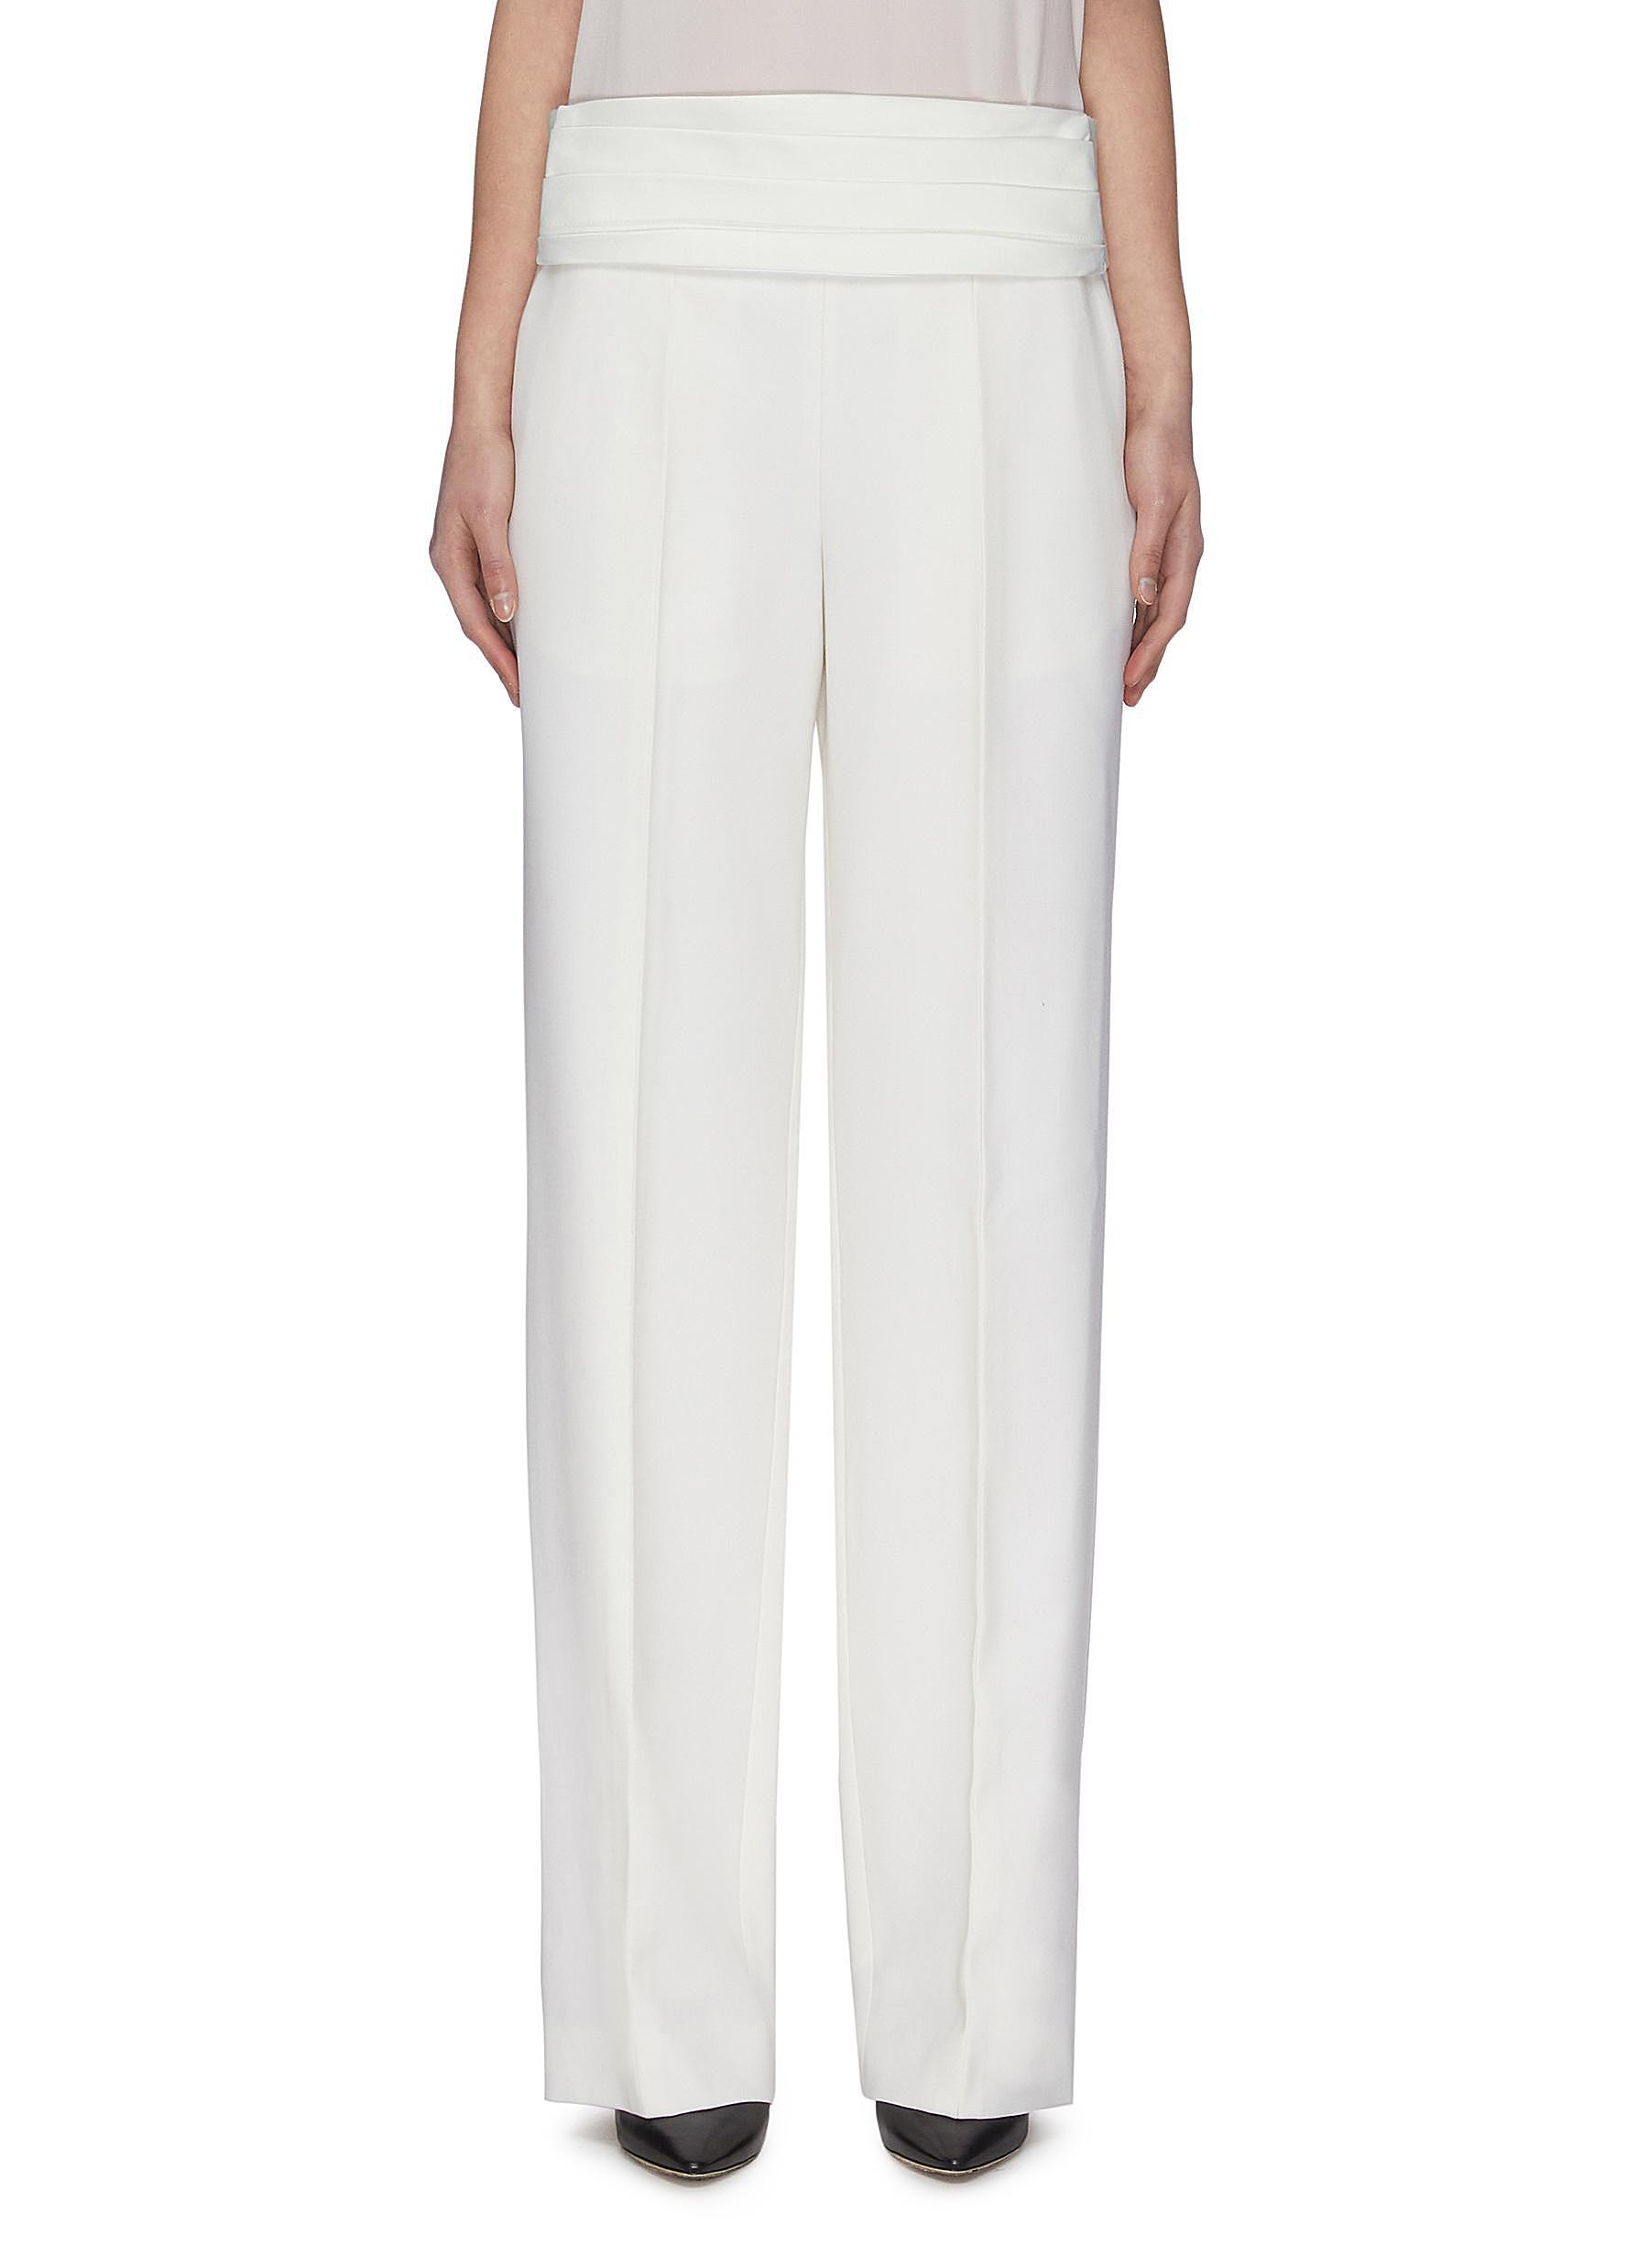 shop Victoria Beckham Cummerbund Tuxedo Pants online